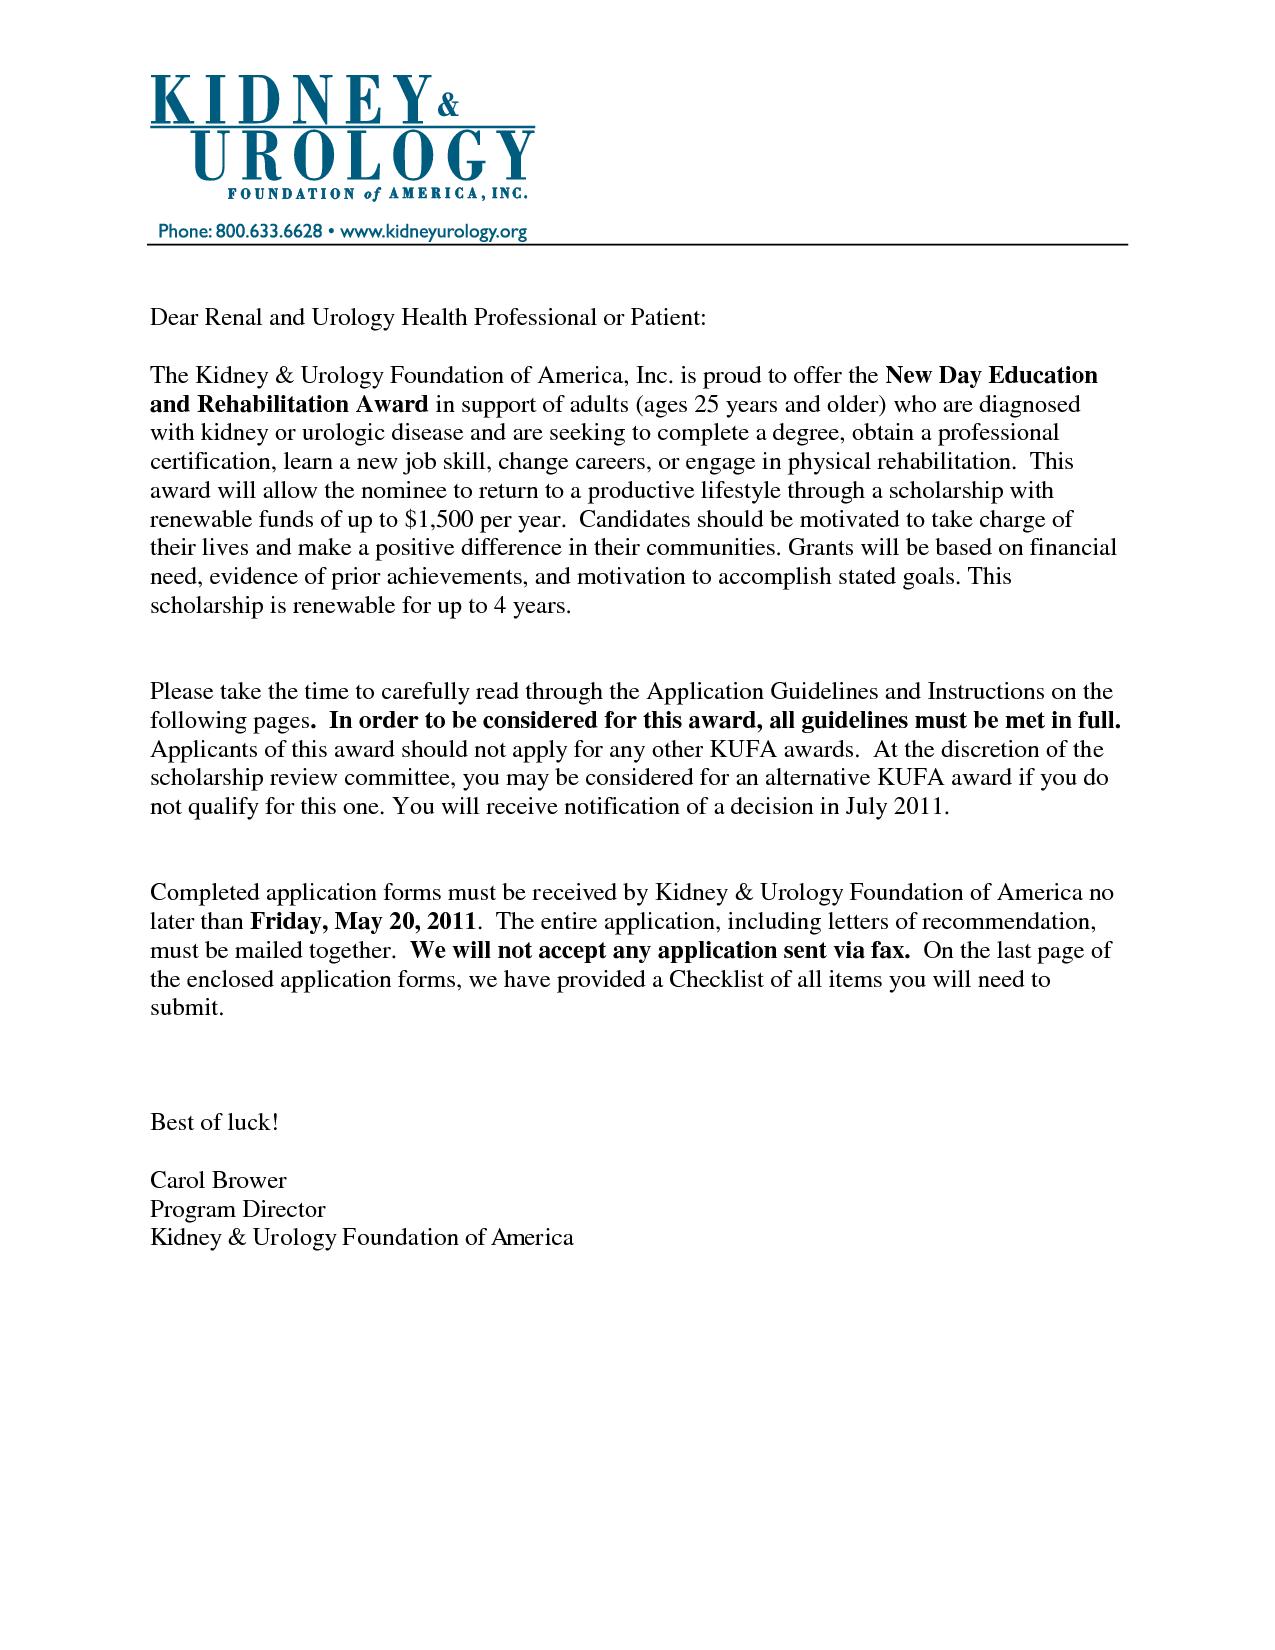 recommendation letter nursing school